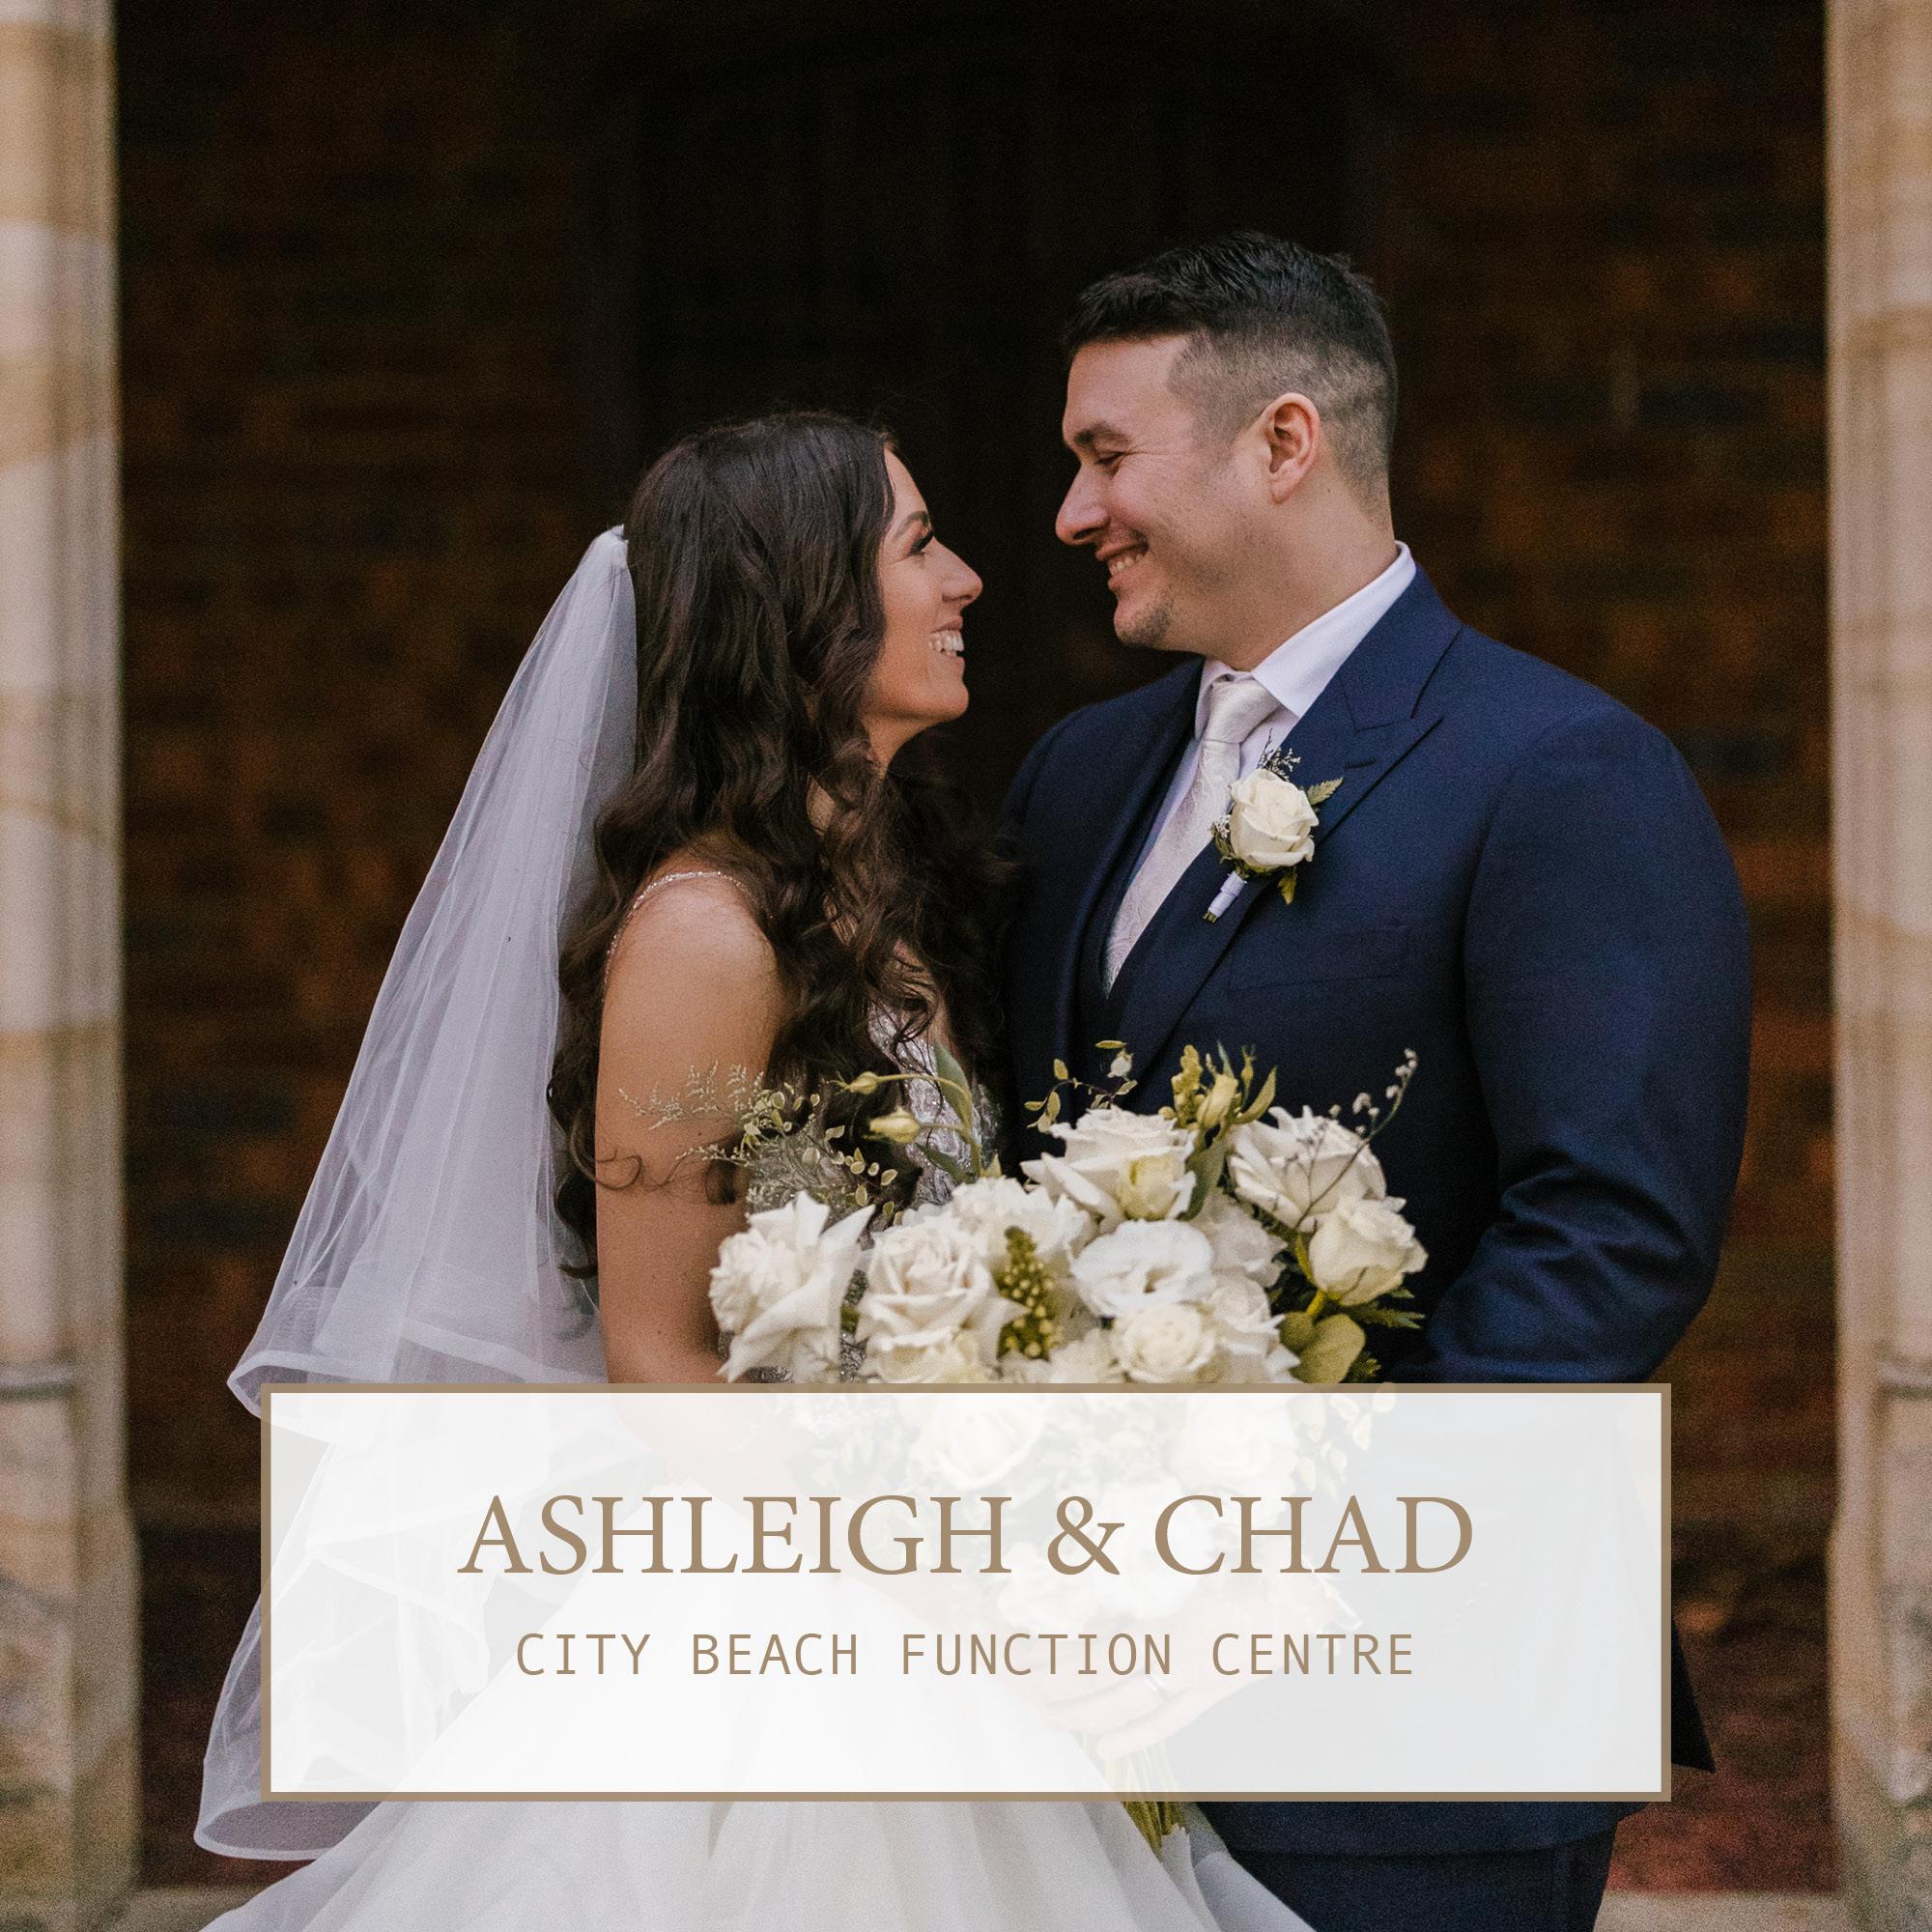 City Beach Function Centre Wedding: Ashleigh & Chad 1